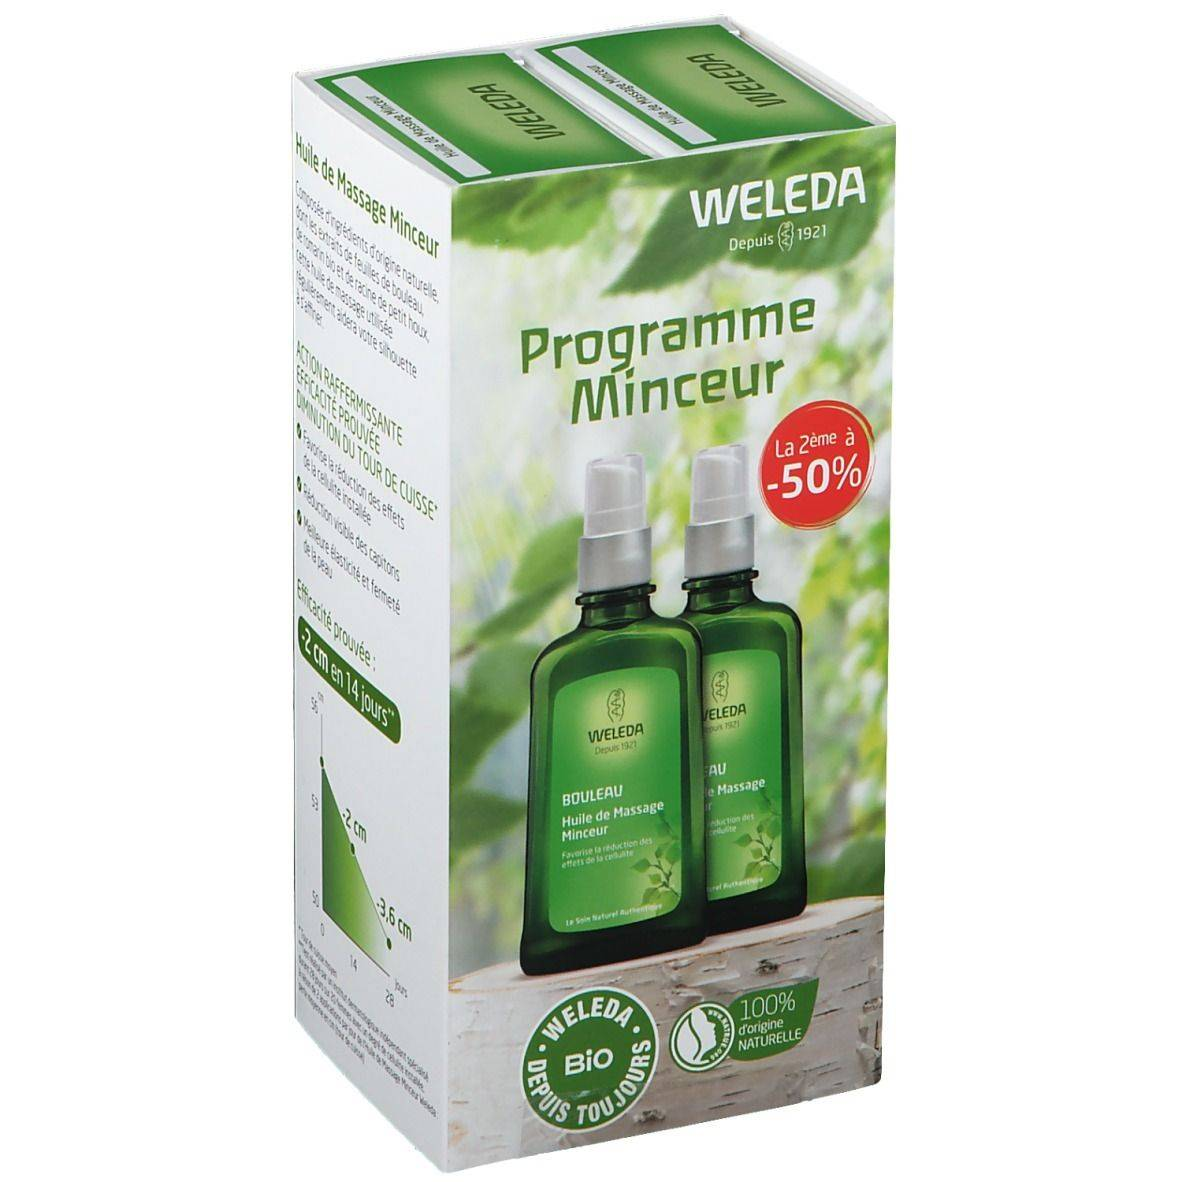 Weleda WEDELA BOULEAU Huile de Massage Minceur ml huile de massage